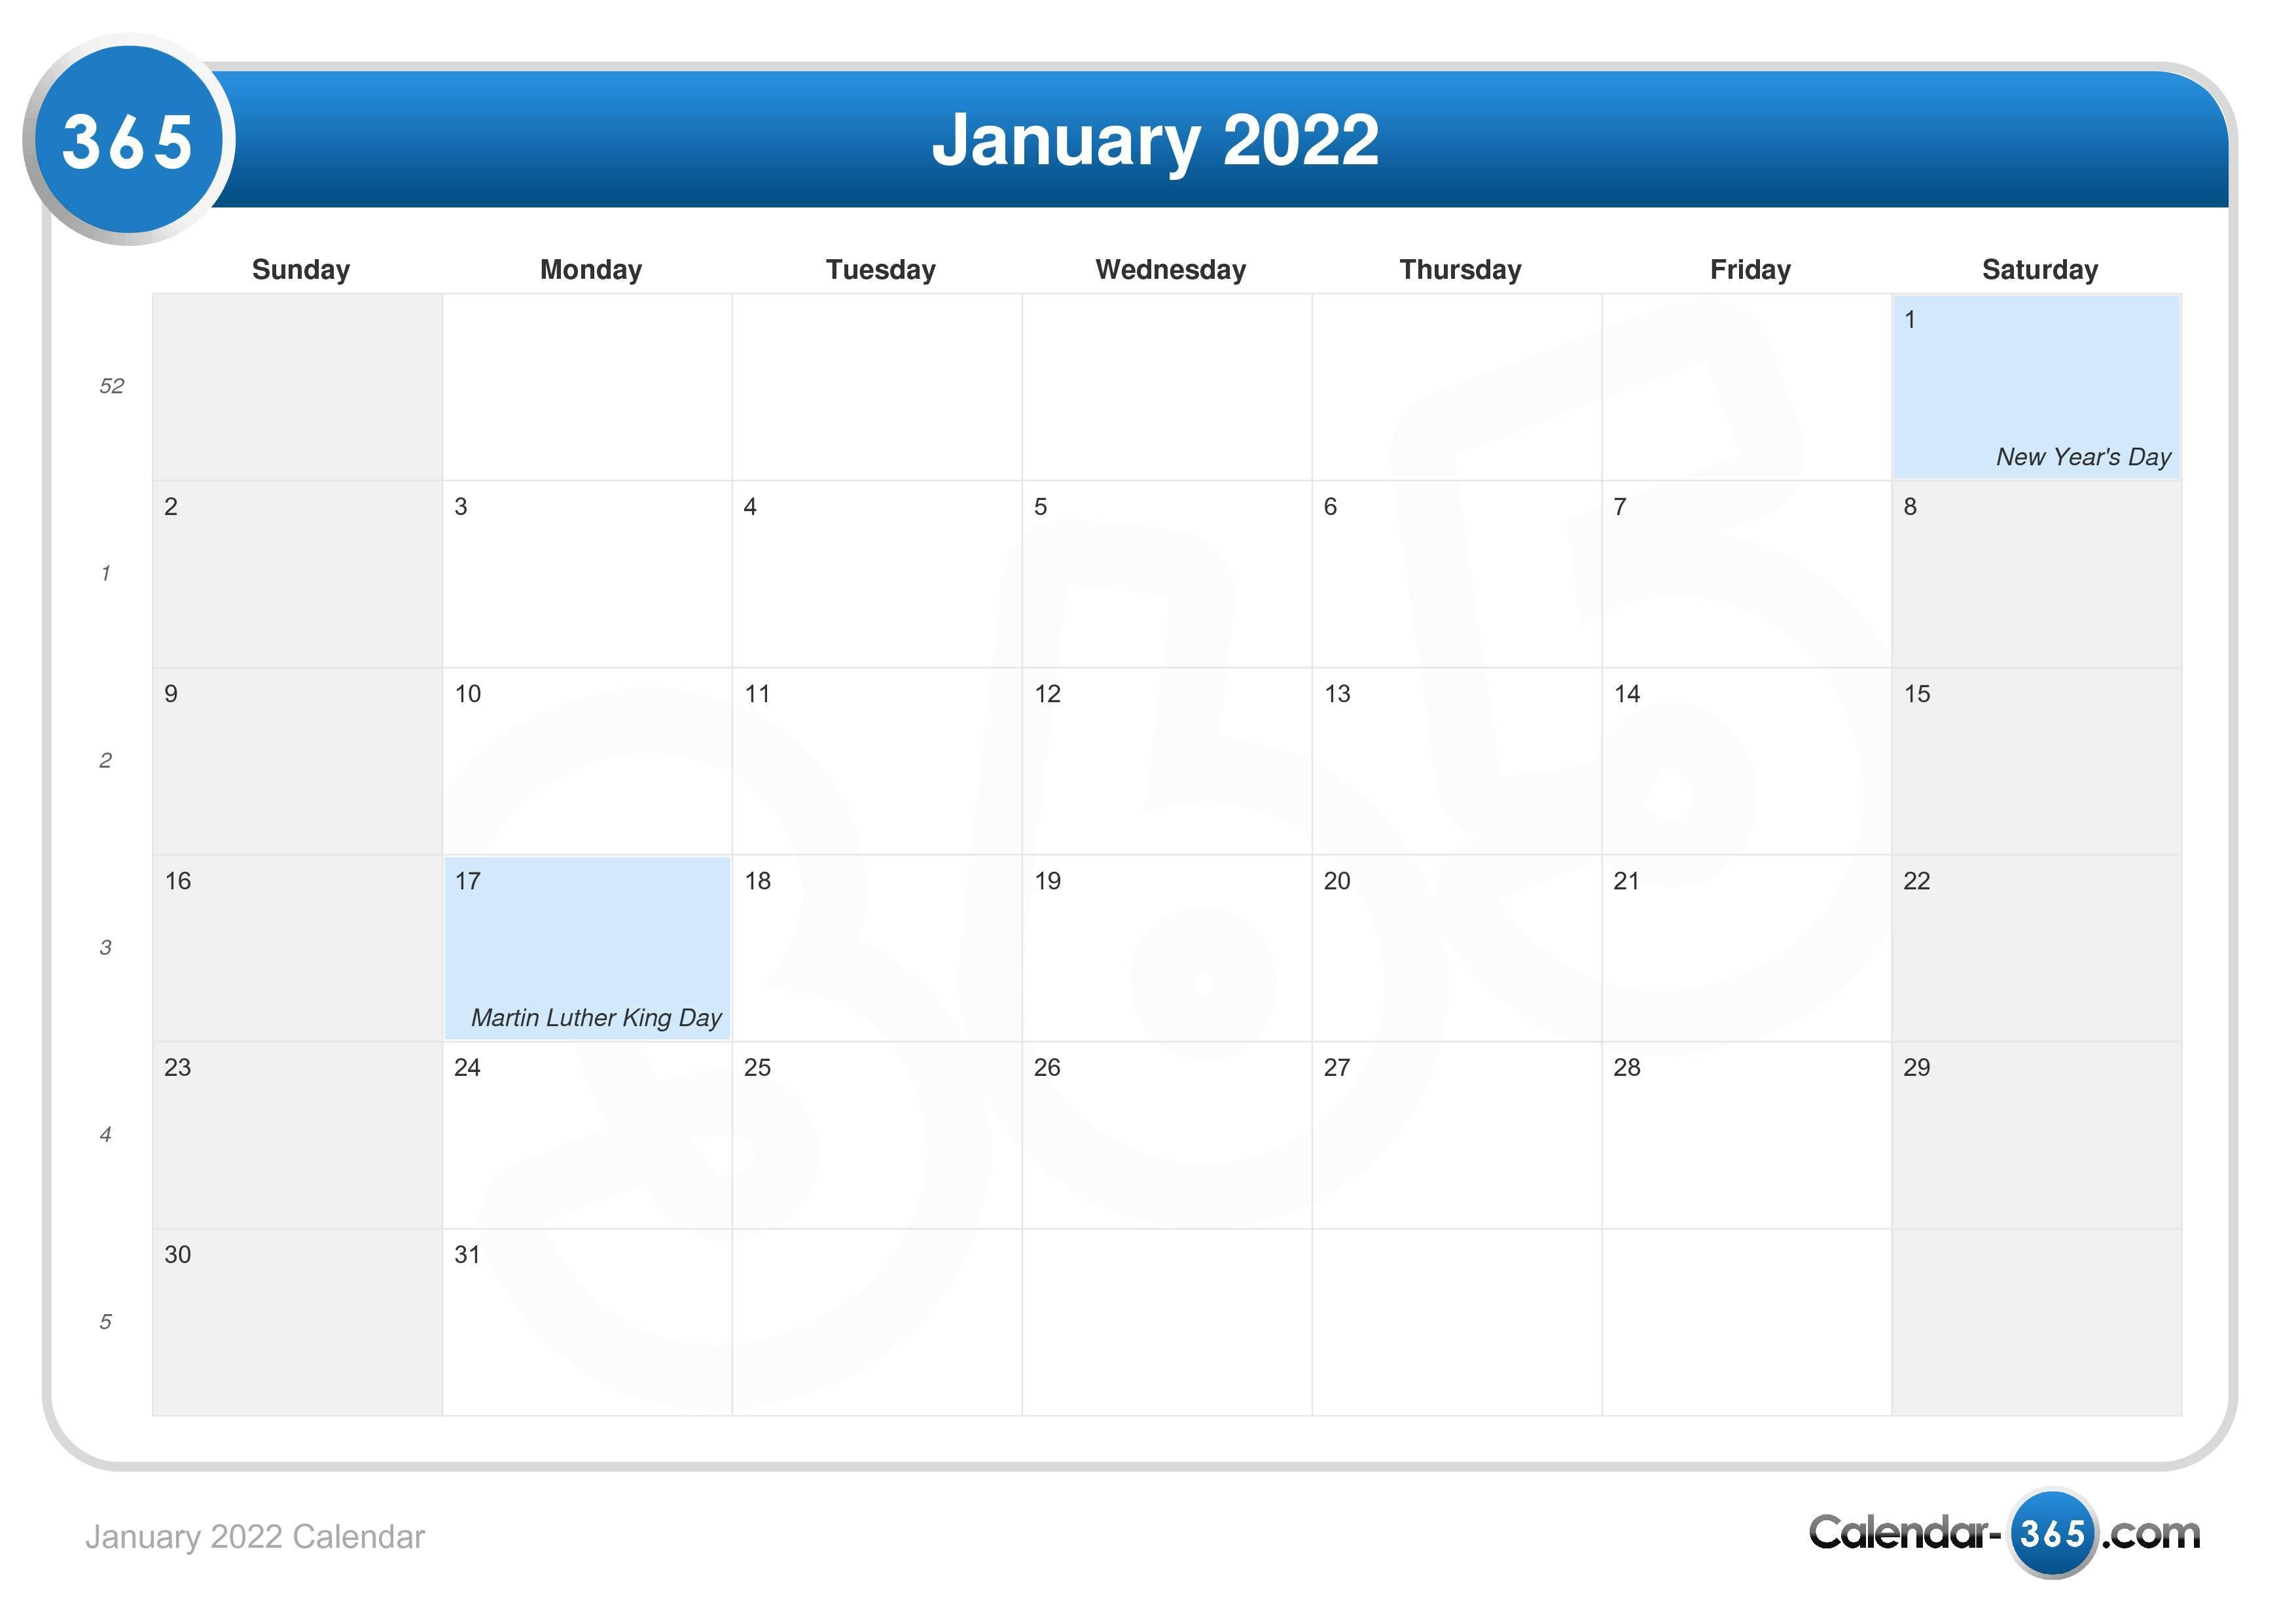 December 2023 And January 2022 Calendar.January 2022 Calendar